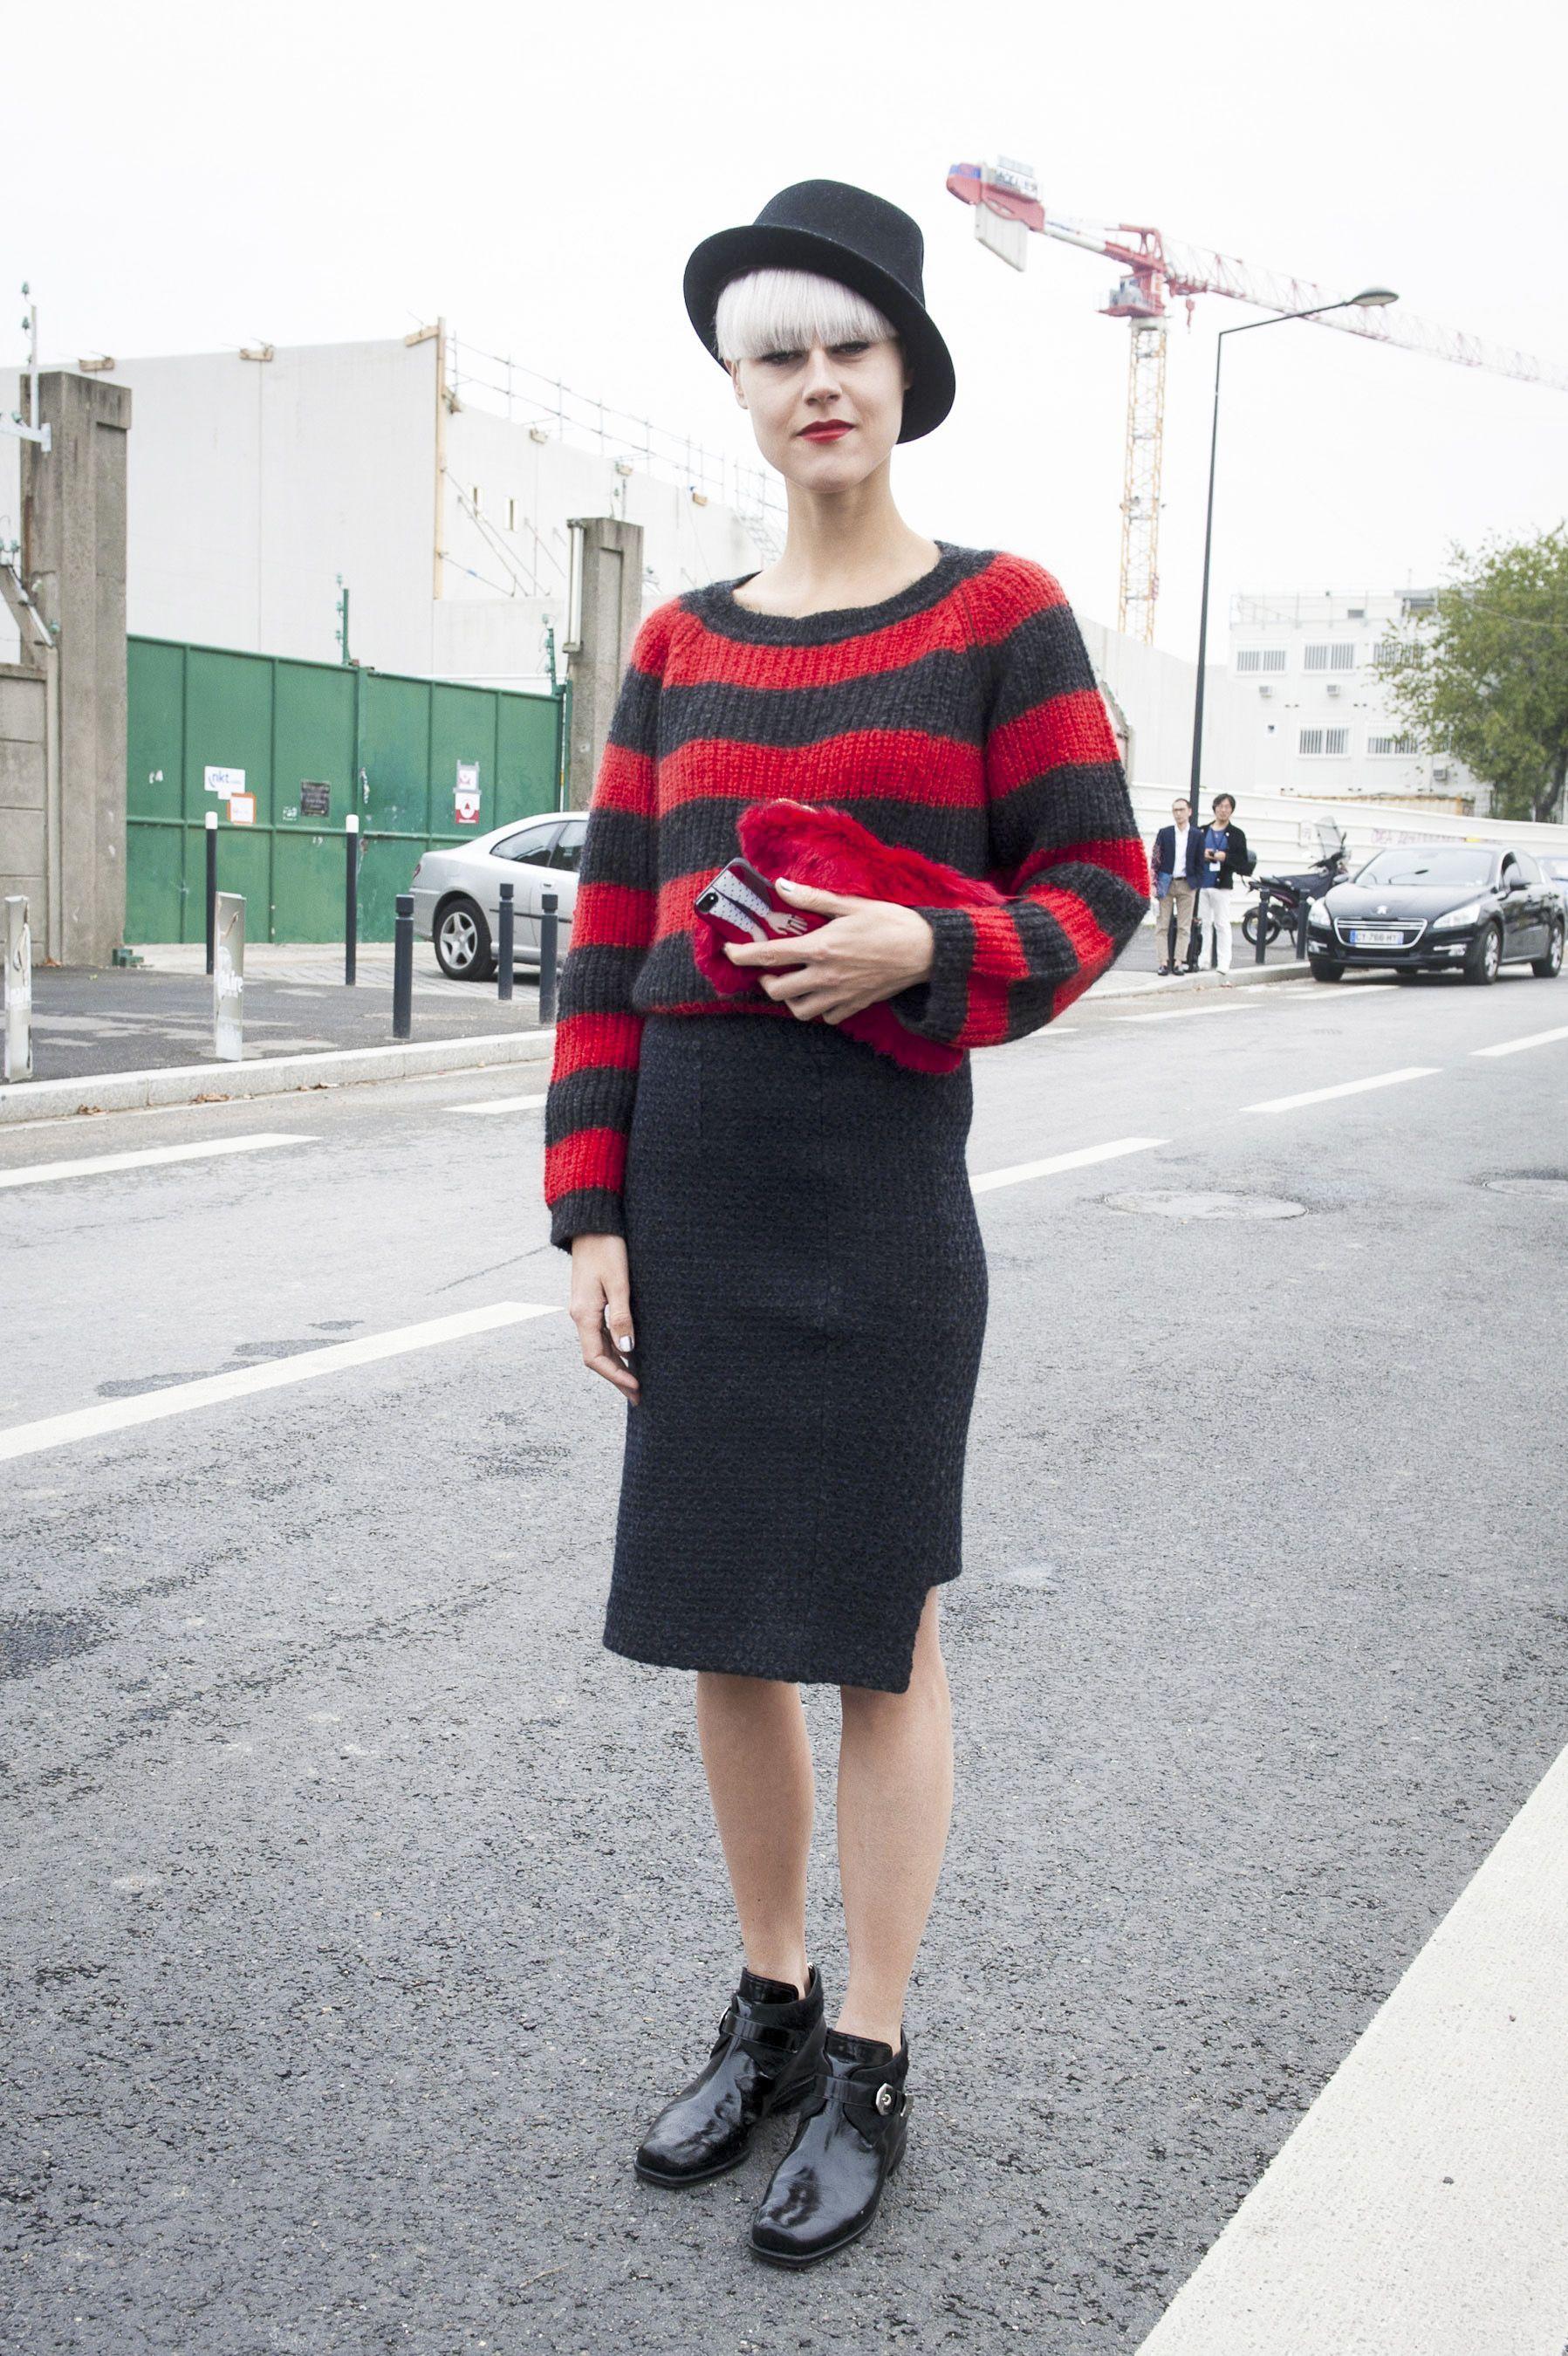 #LindaTol getting her stripe on. Paris. #LifestyleHunters